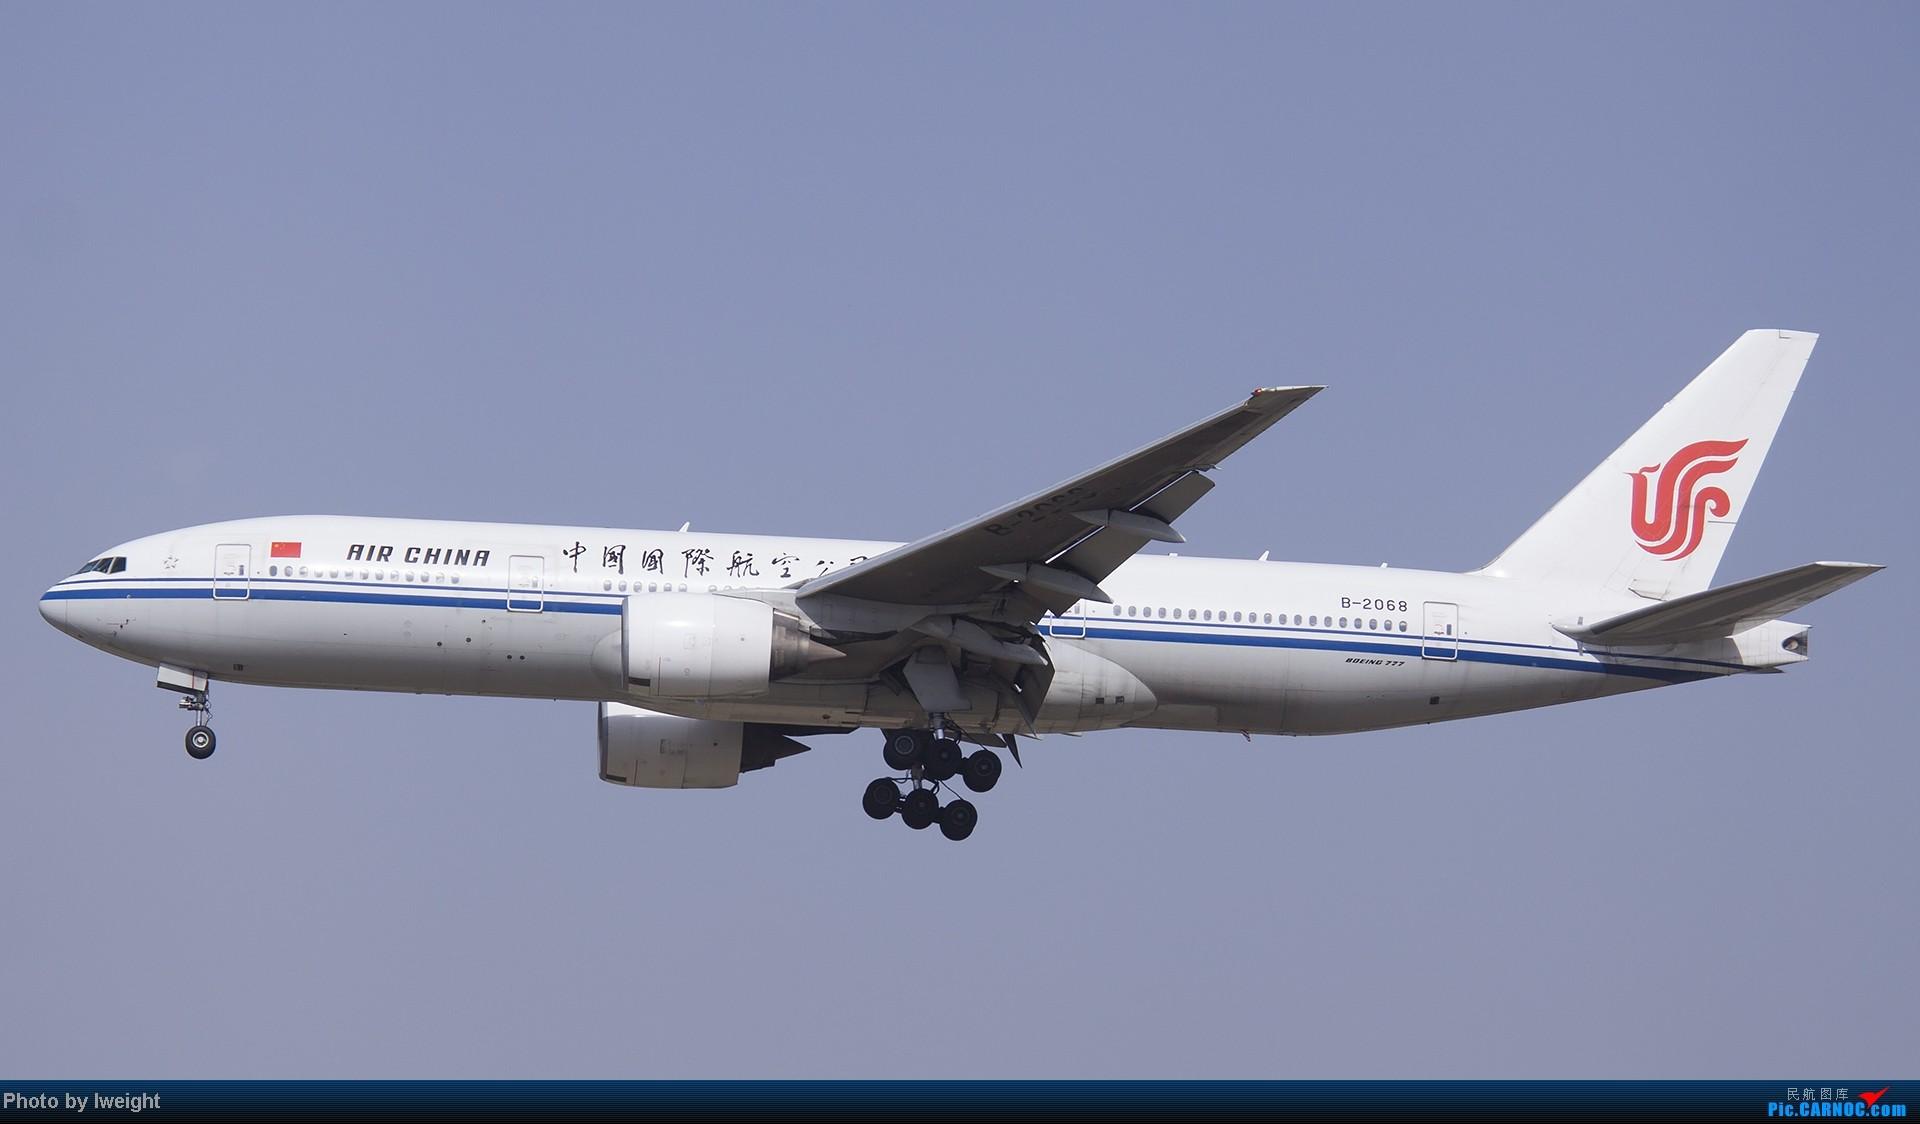 Re:[原创]5月3日首都机场风云变幻的下午 BOEING 777-200 B-2068 中国北京首都机场